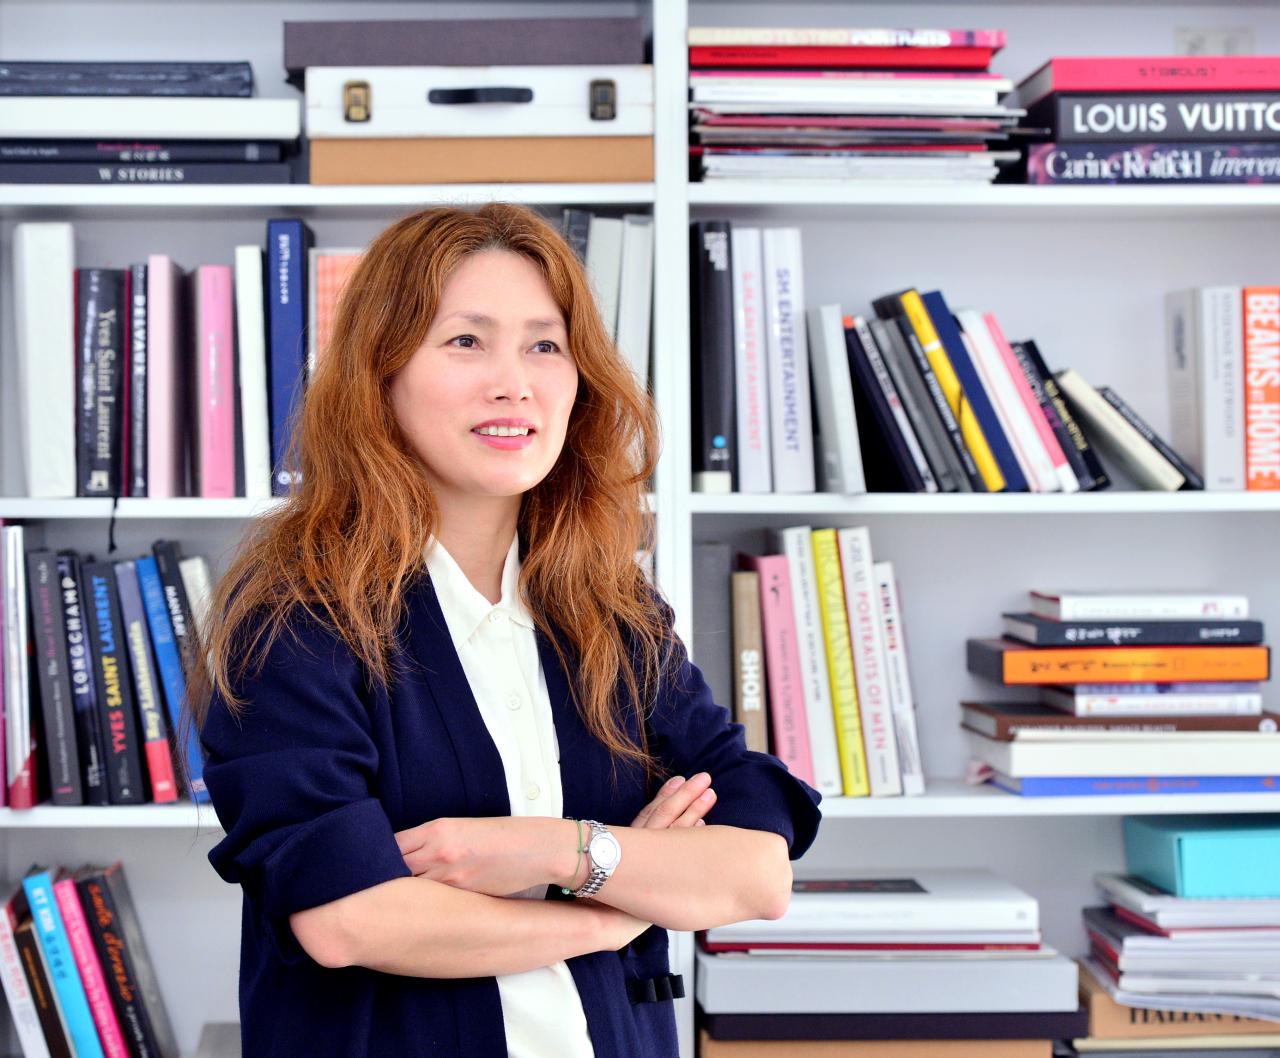 Jeon Mi-kyung, director of Seoul Fashion Week, poses on Oct. 8 at her office in Gangnam-gu, southern Seoul. (Park Hyun-koo/The Korea Herald)